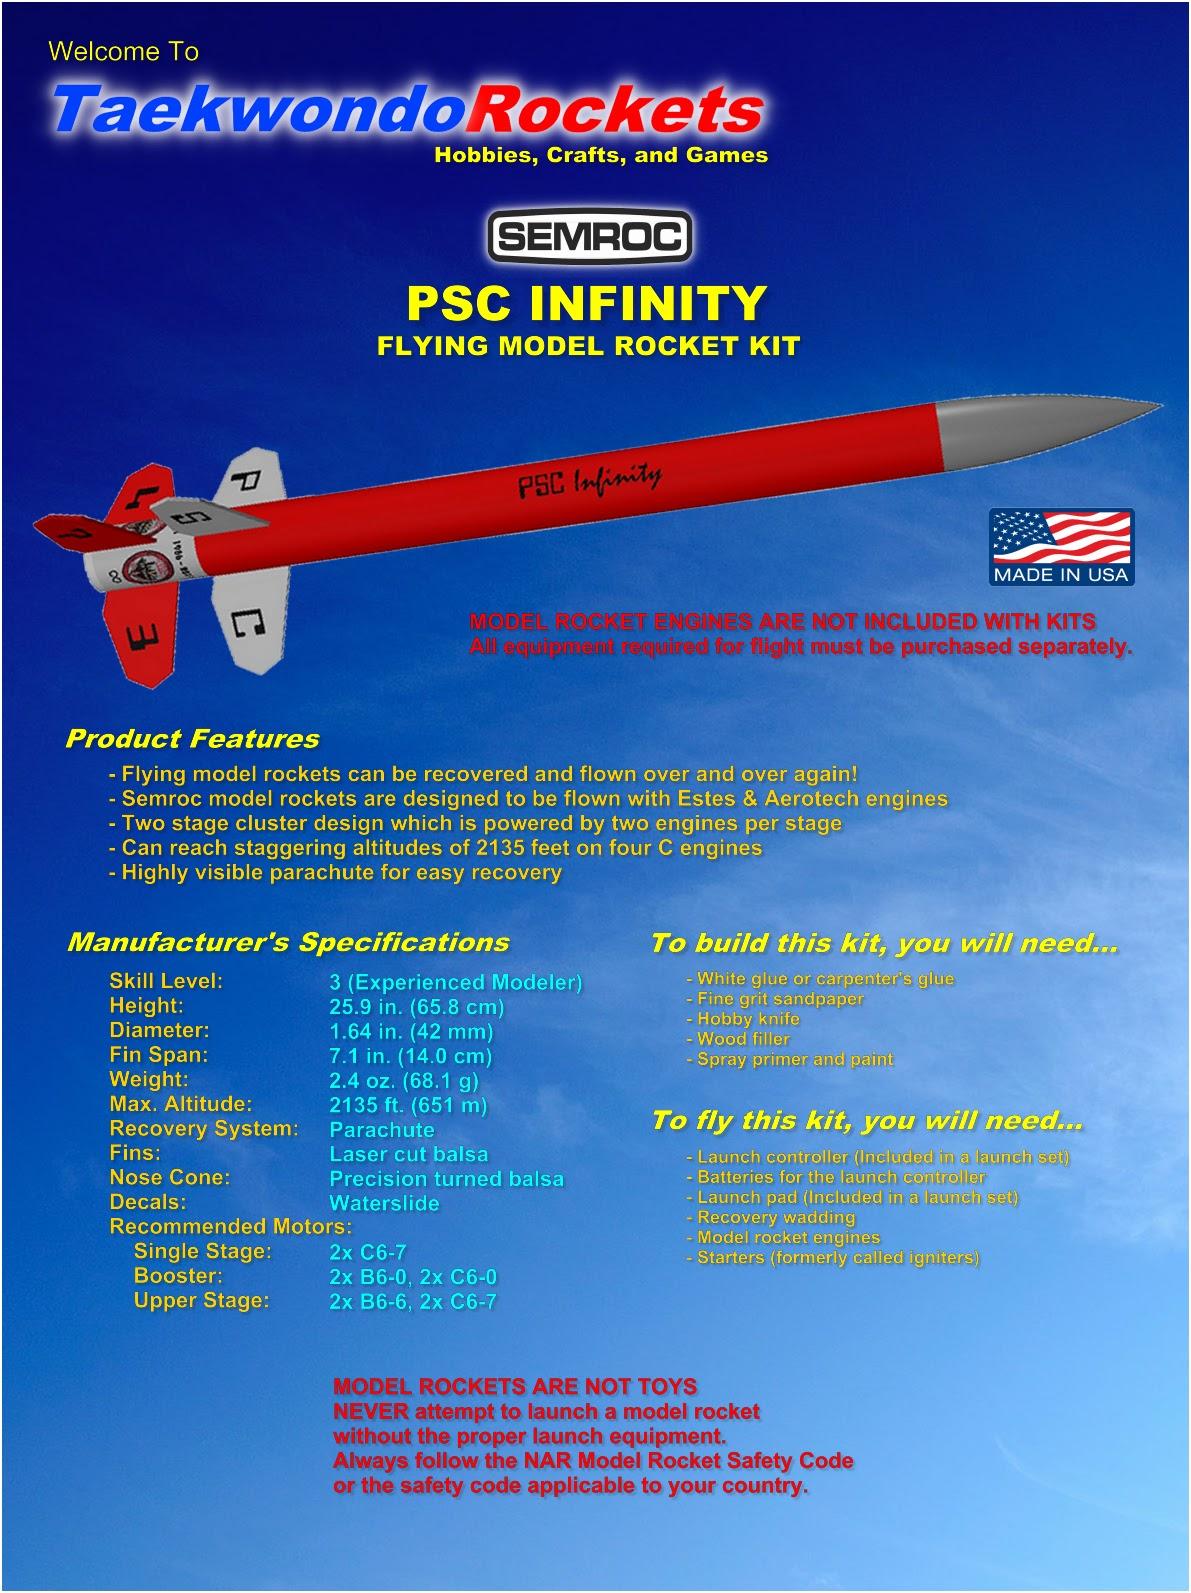 Models & Kits Semroc Flying Model Rocket Kit PSC Infinity KN-5